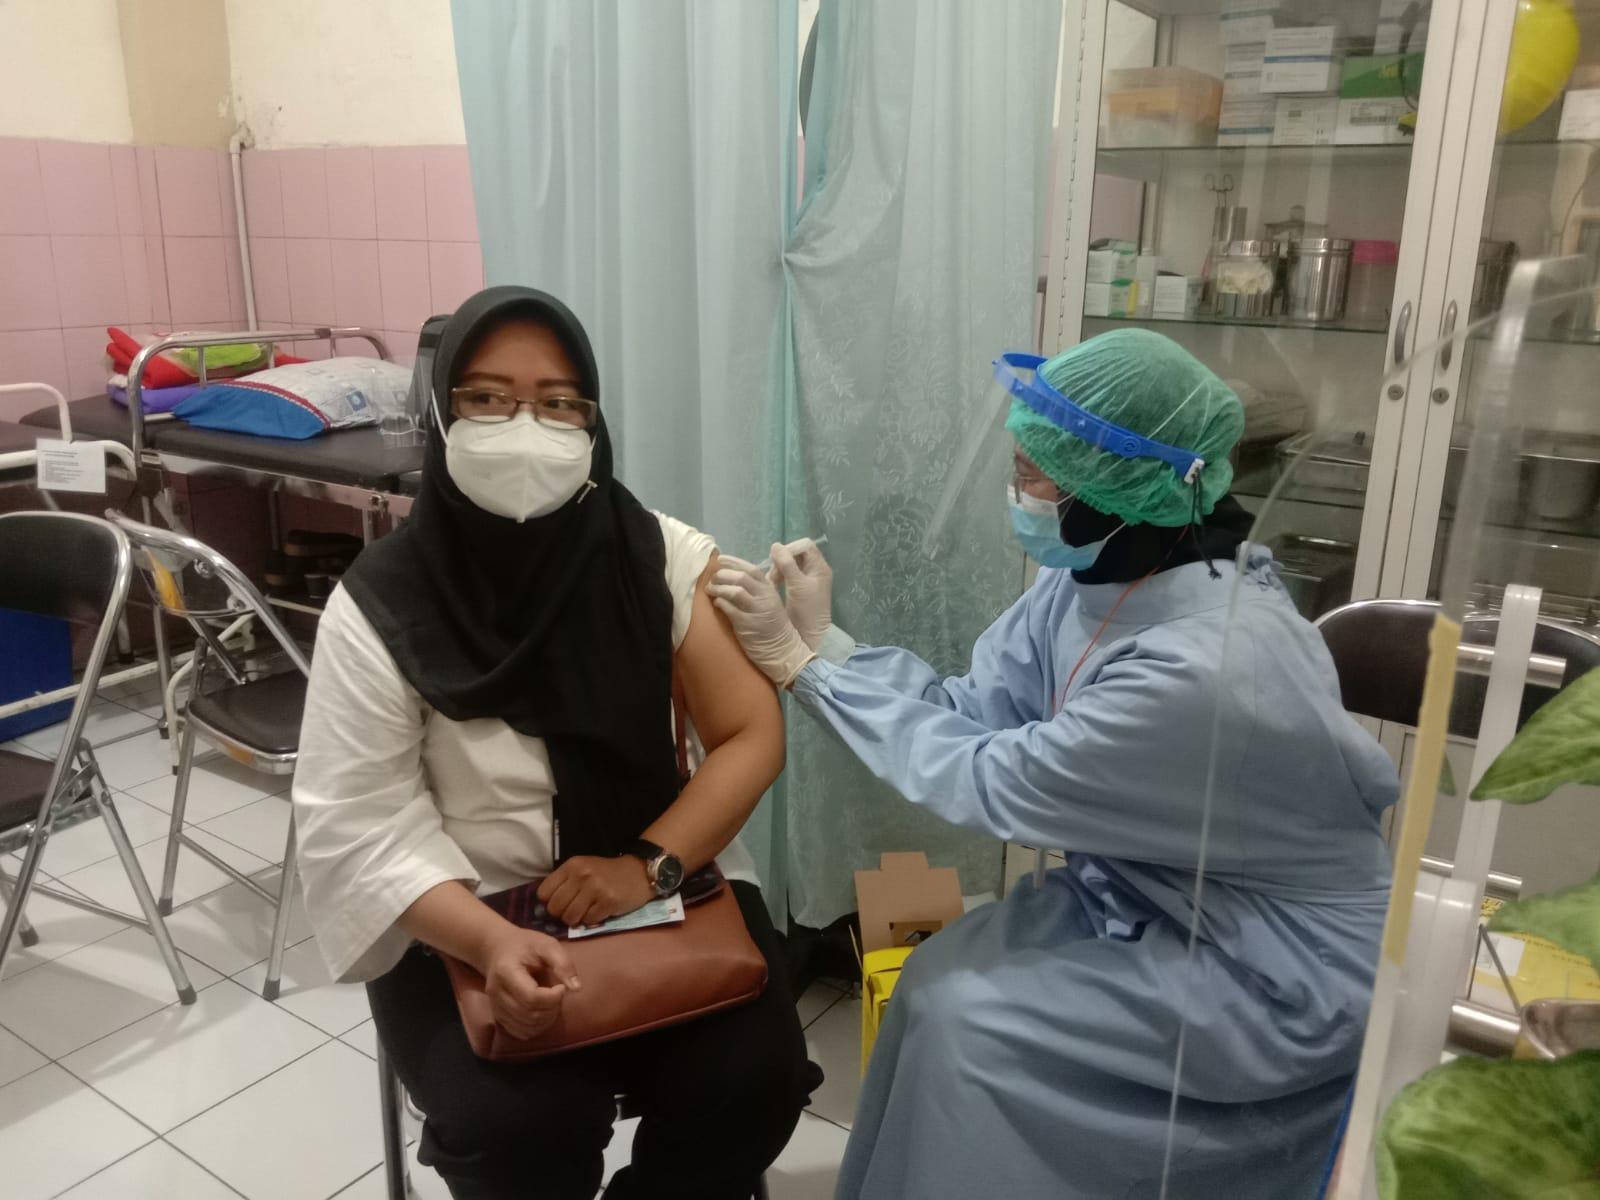 Vaksinasi tahap kedua yang diberikan kepada ASN di Kota Malang. (Foto:Azmy/Tugu Jatim)